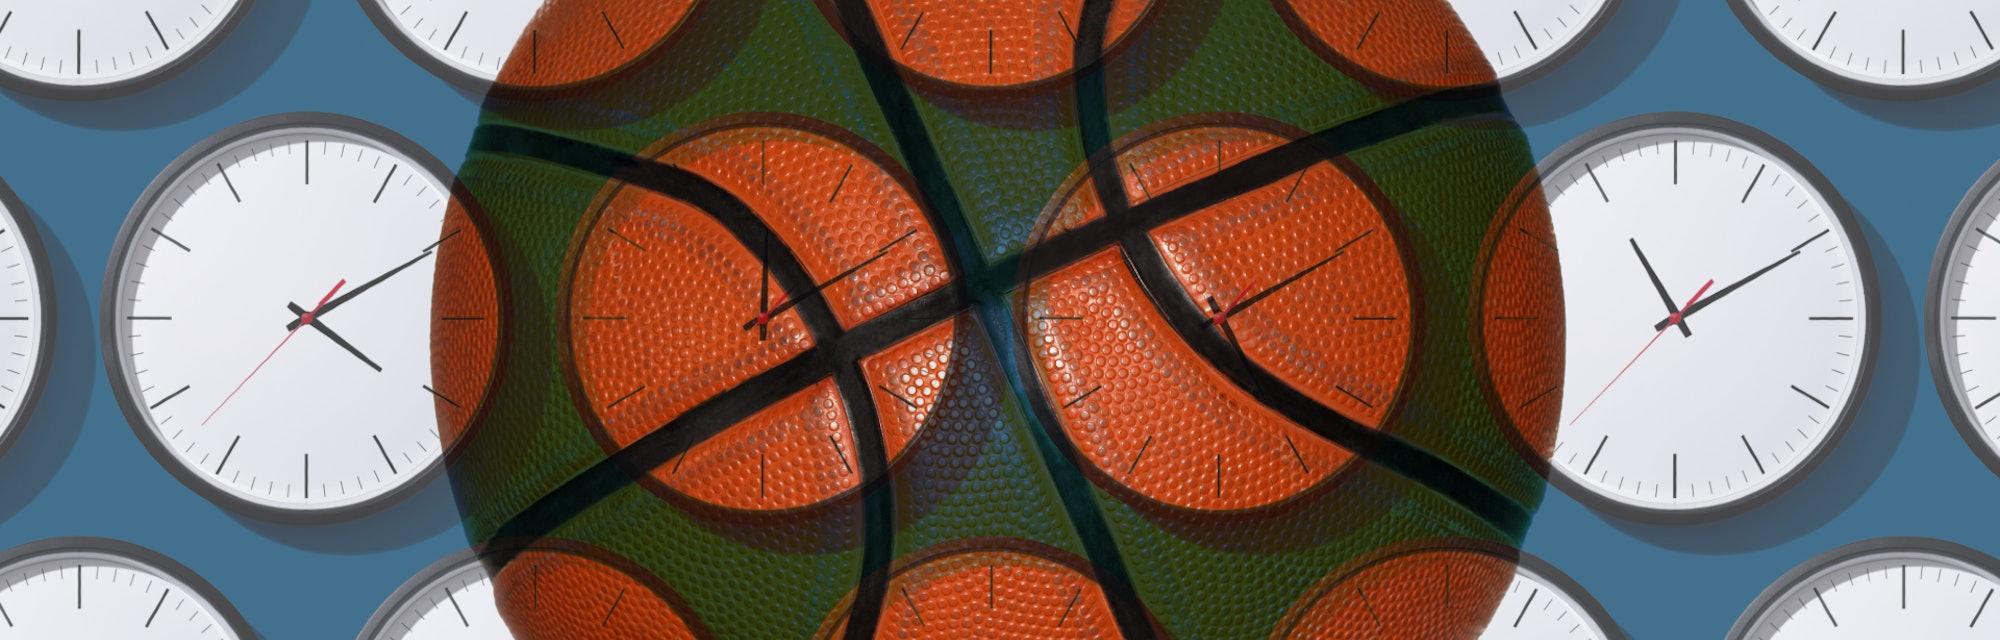 basketball, clocks